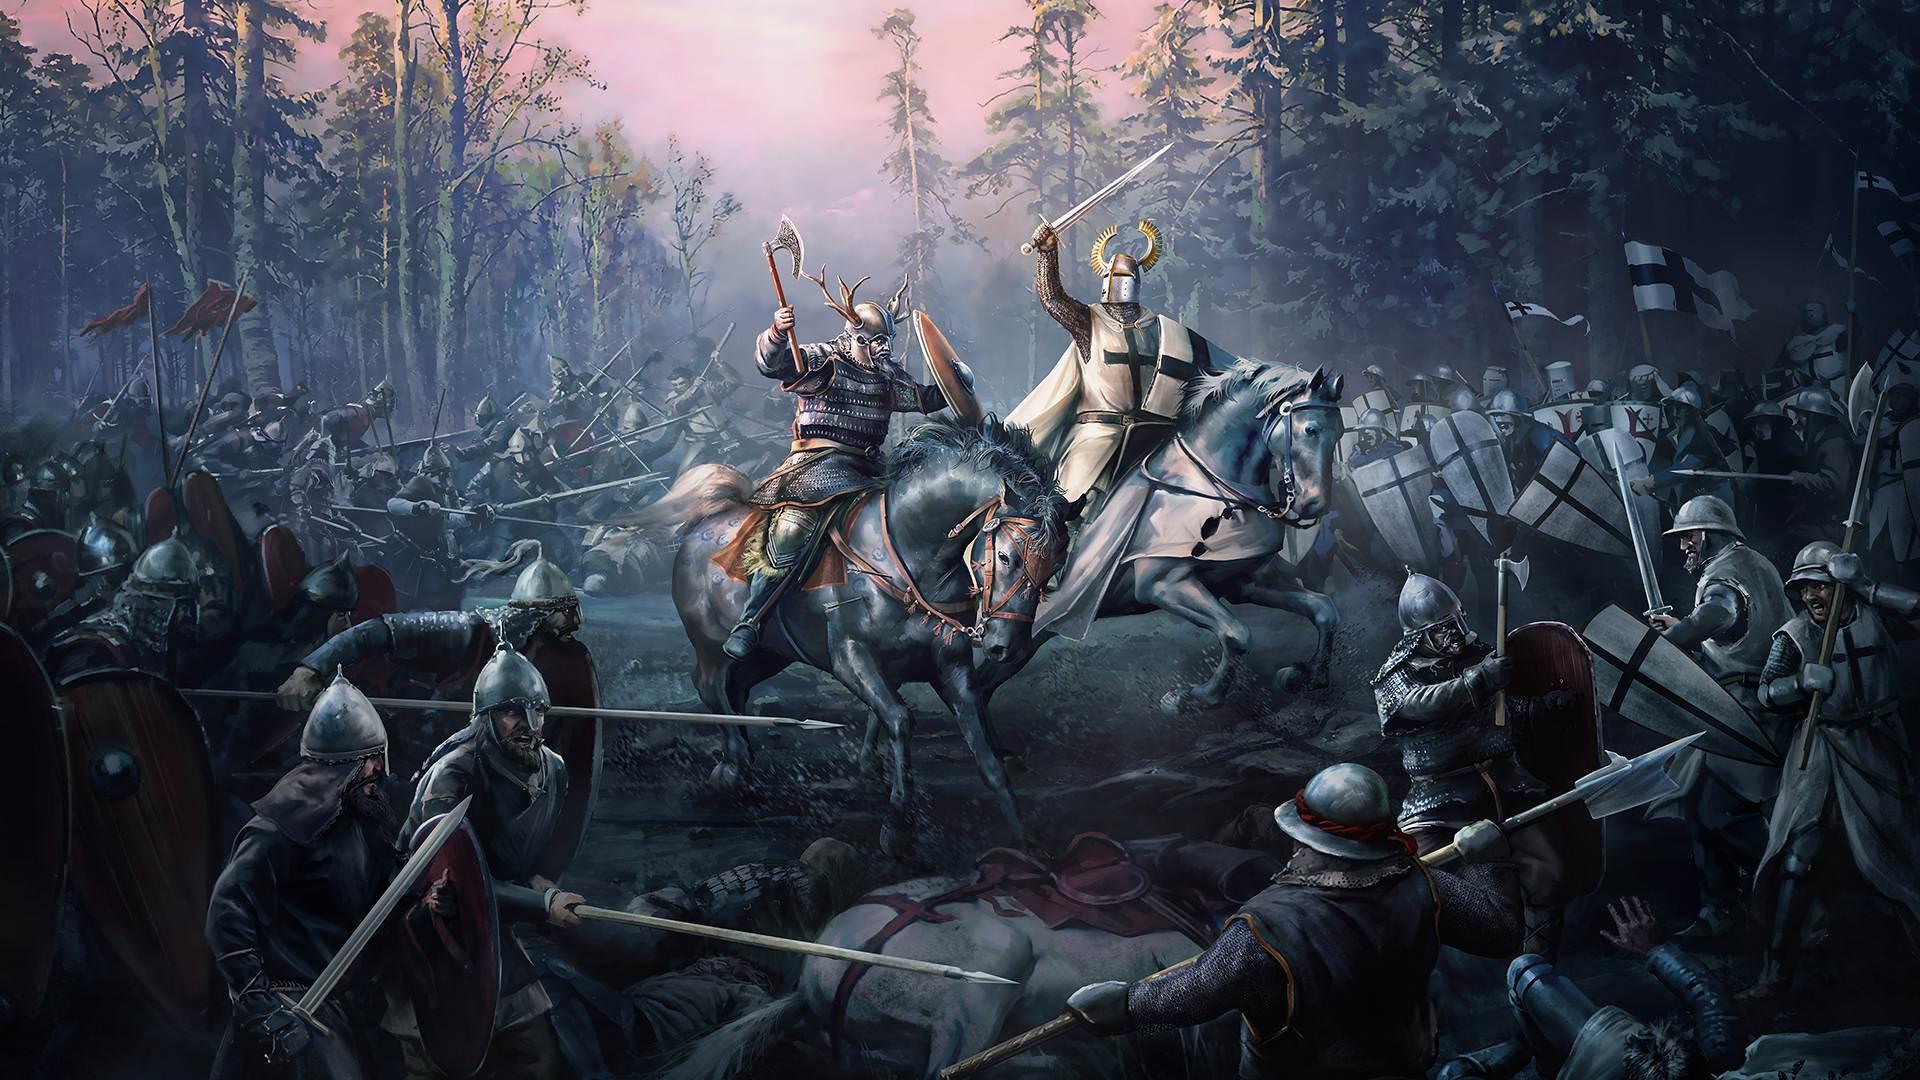 Халява: в Steam бесплатно раздают дополнение для Crusader Kings 2